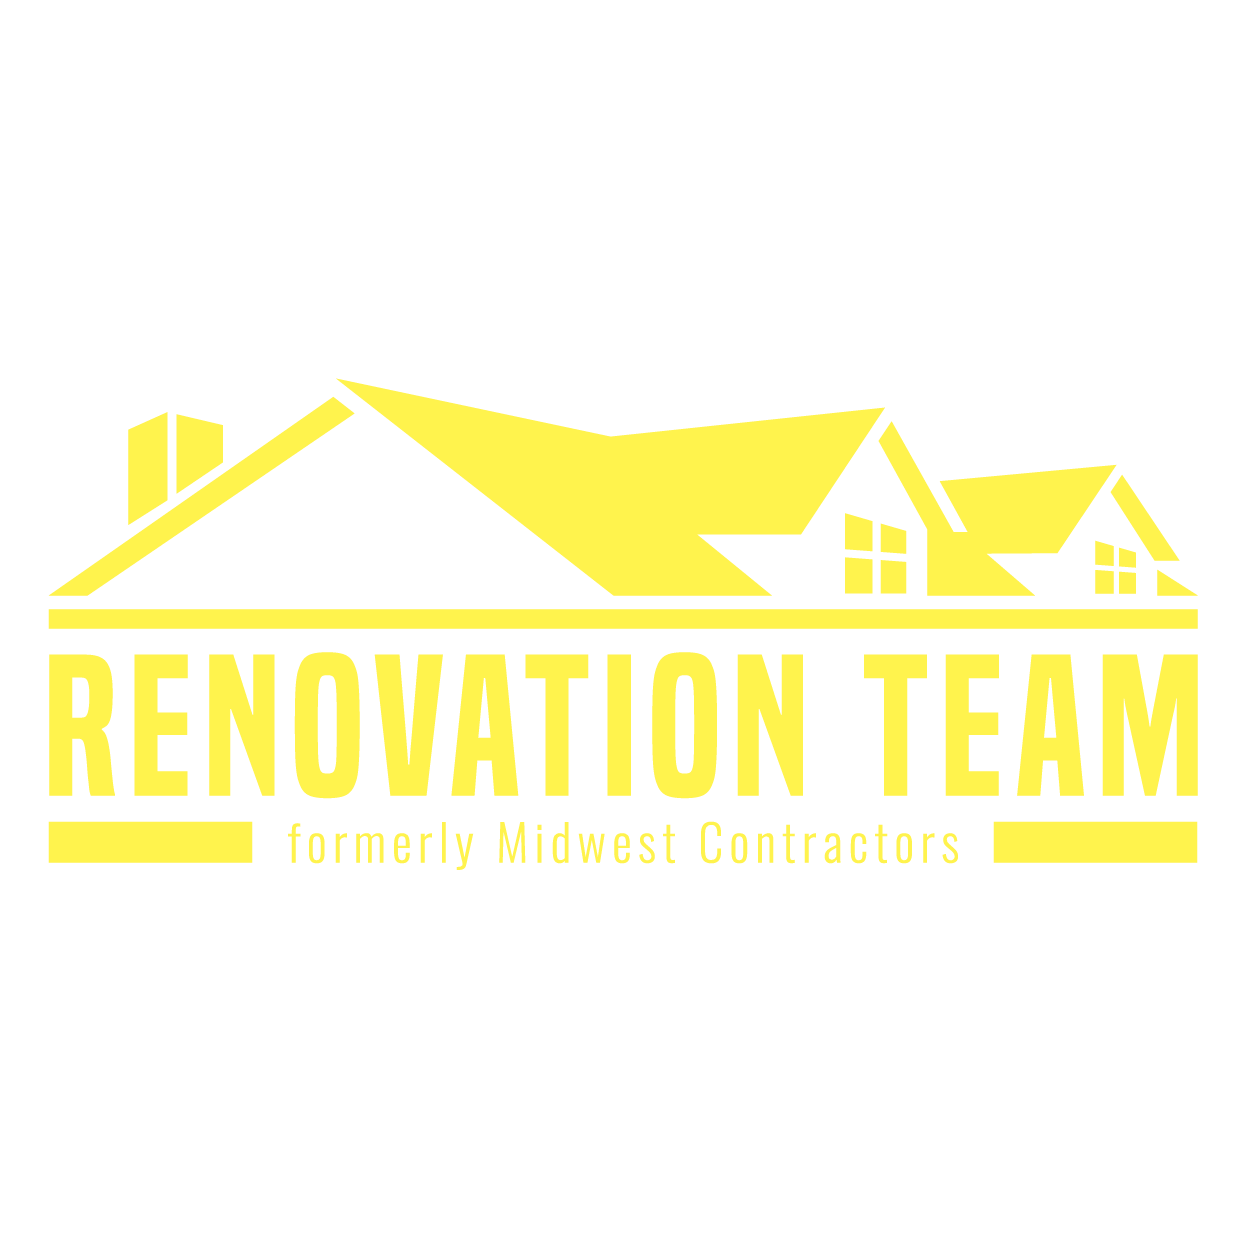 Renovation Team